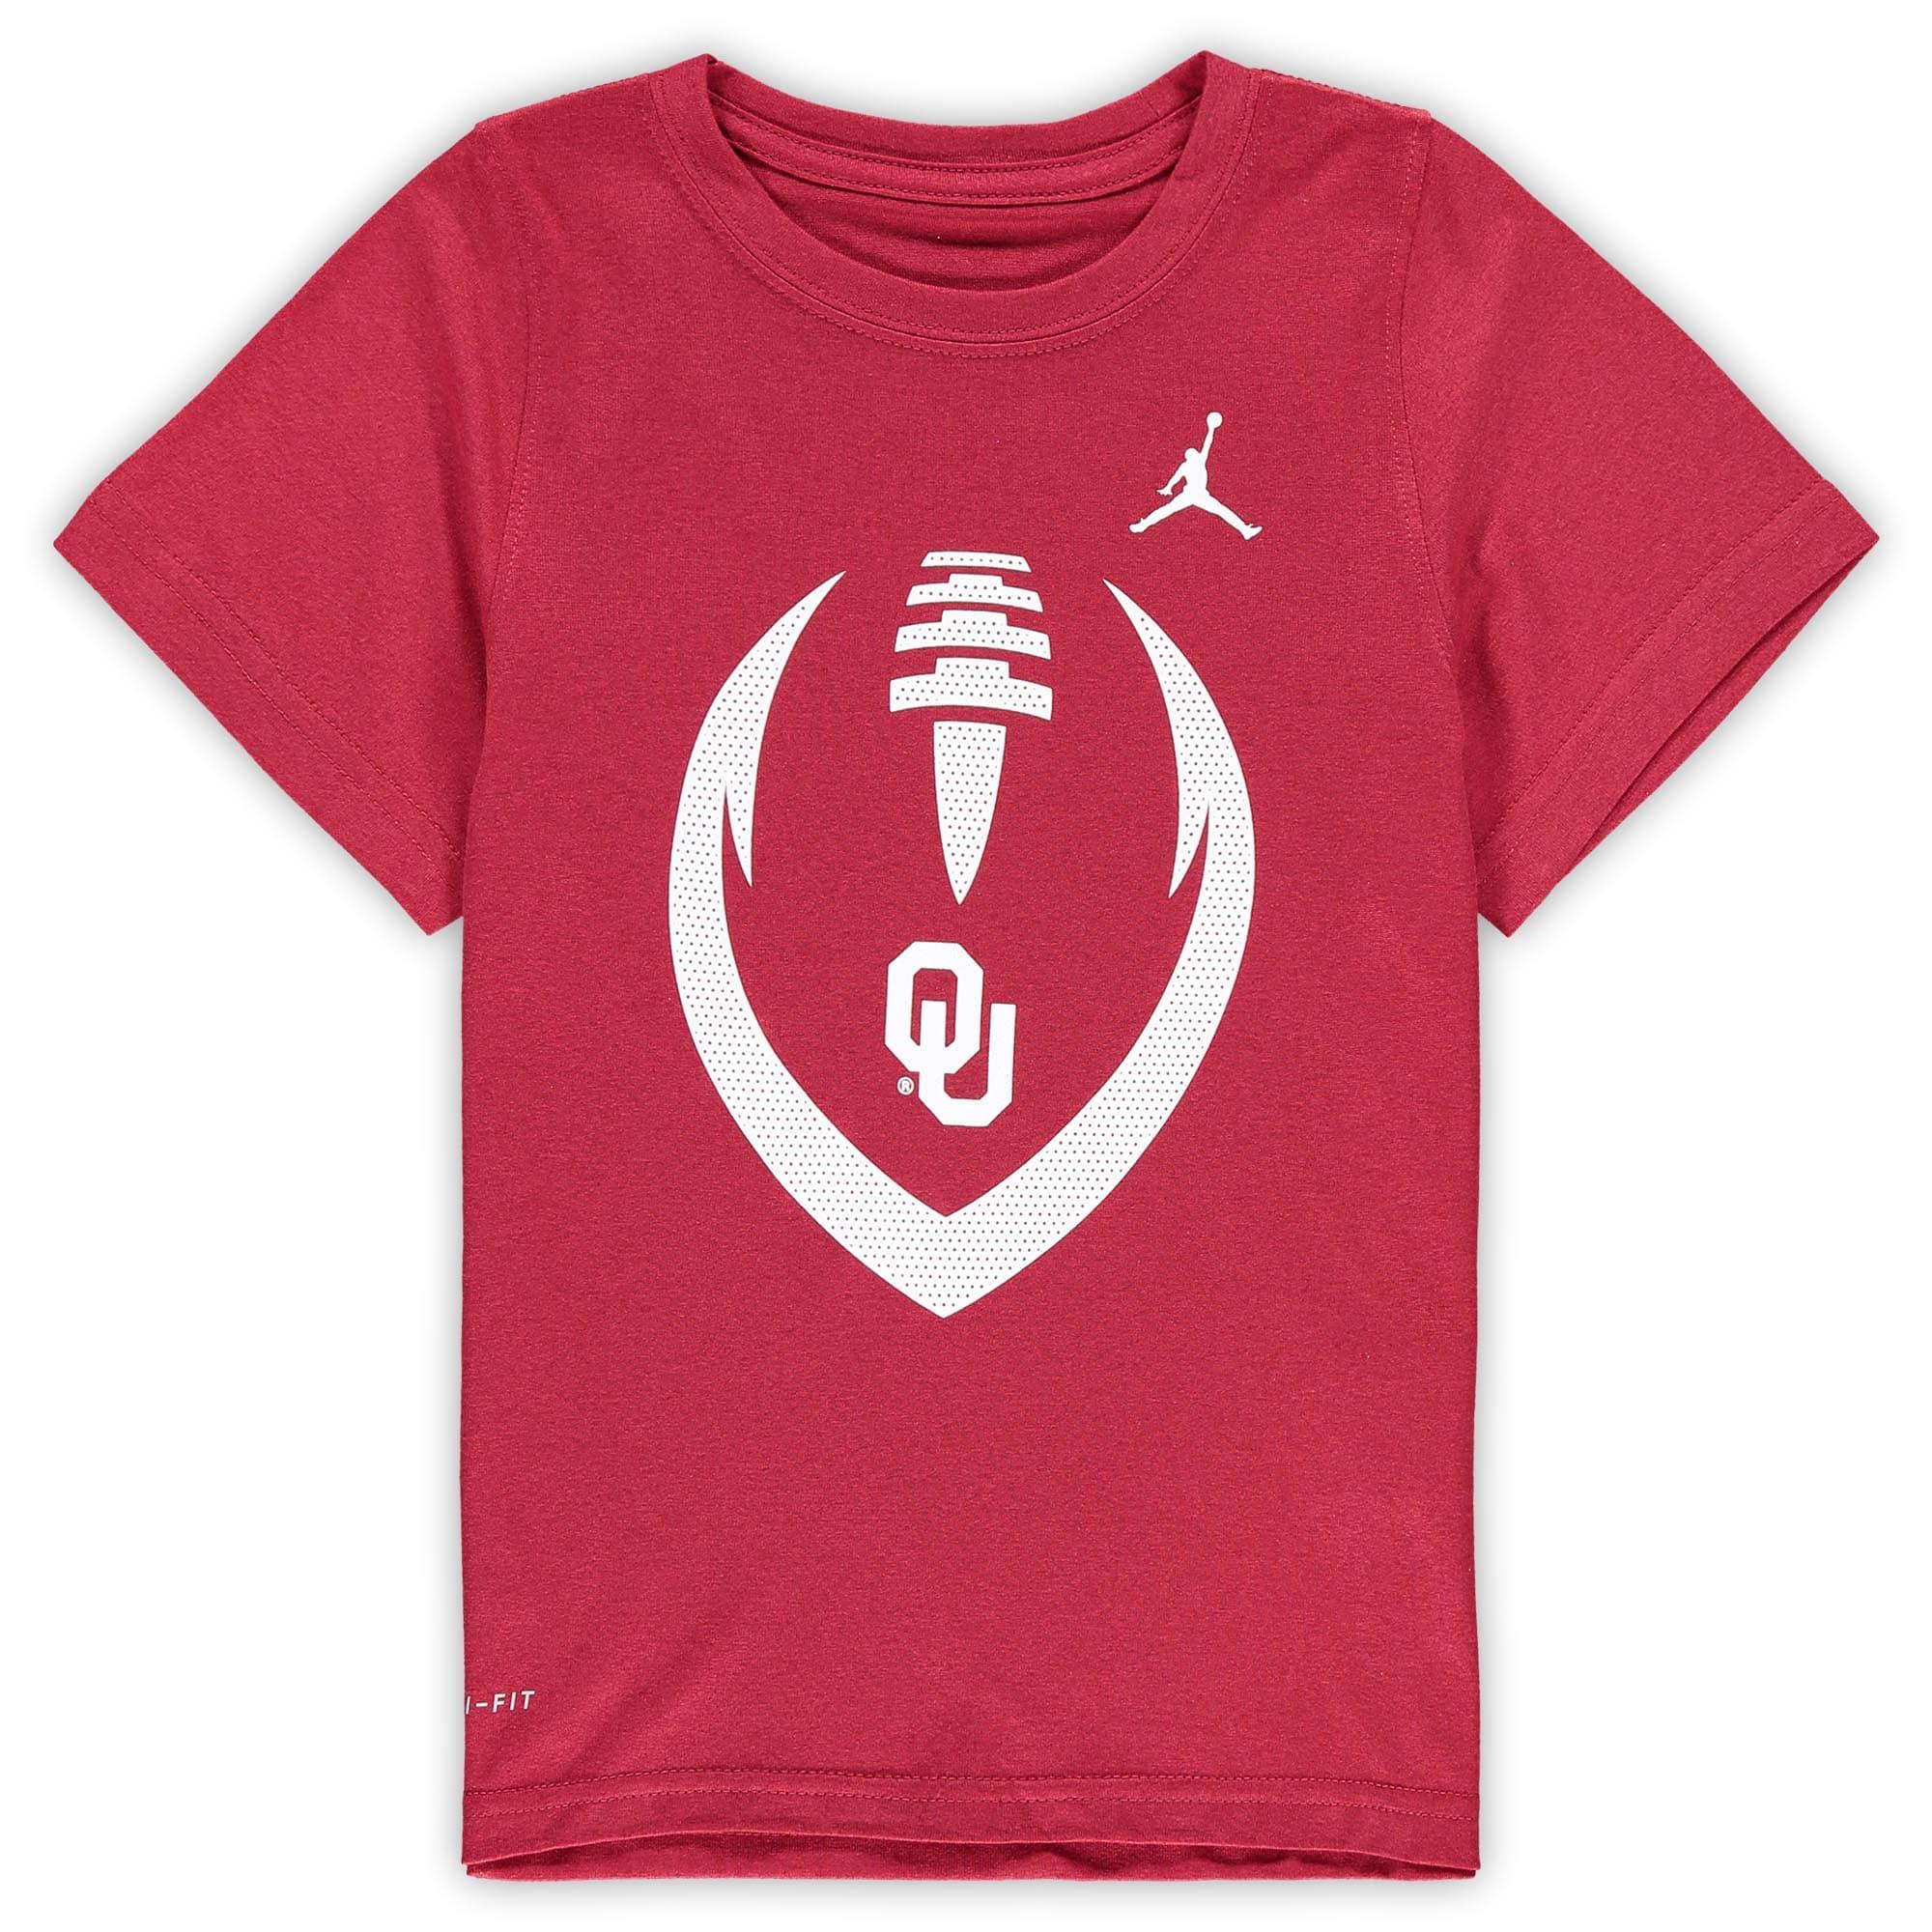 Oklahoma Sooners Jordan Brand Preschool Football Icon Performance T-Shirt - Crimson